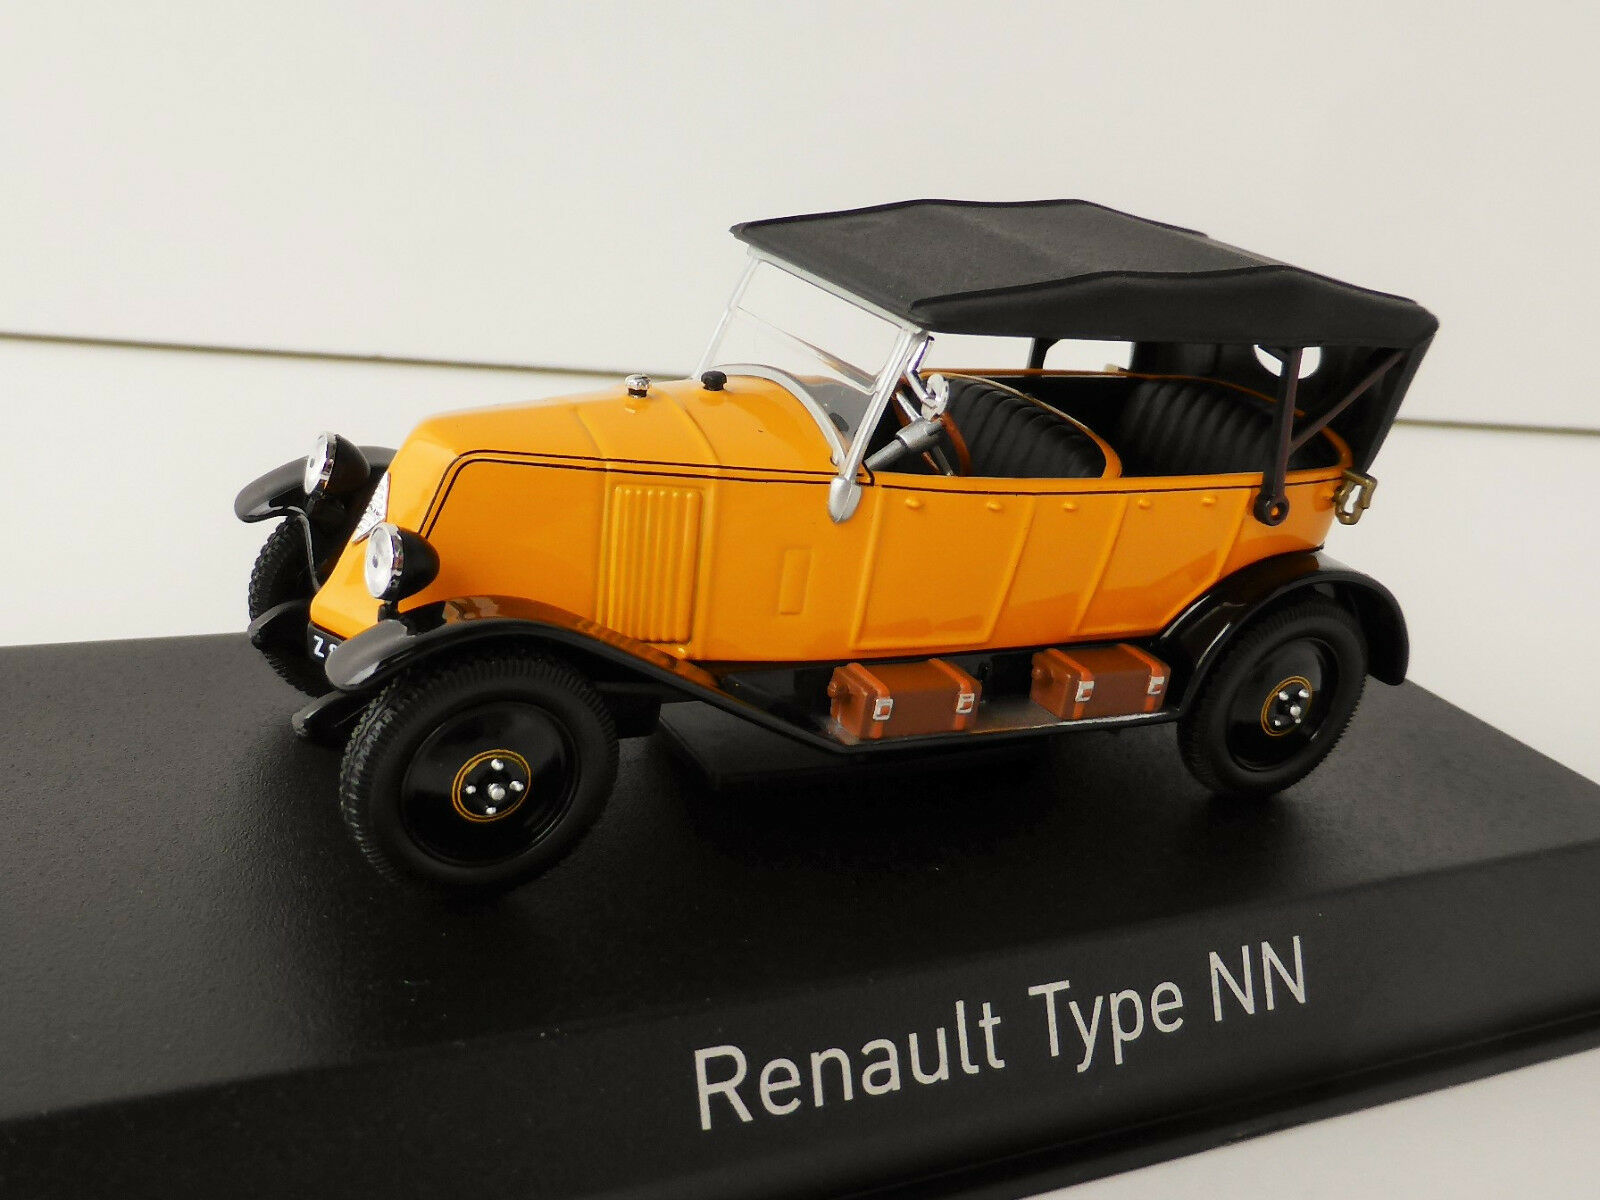 Renault Tipo Nn Torpedo 1927 1/43 Norev 519511 Tipo Pg 2